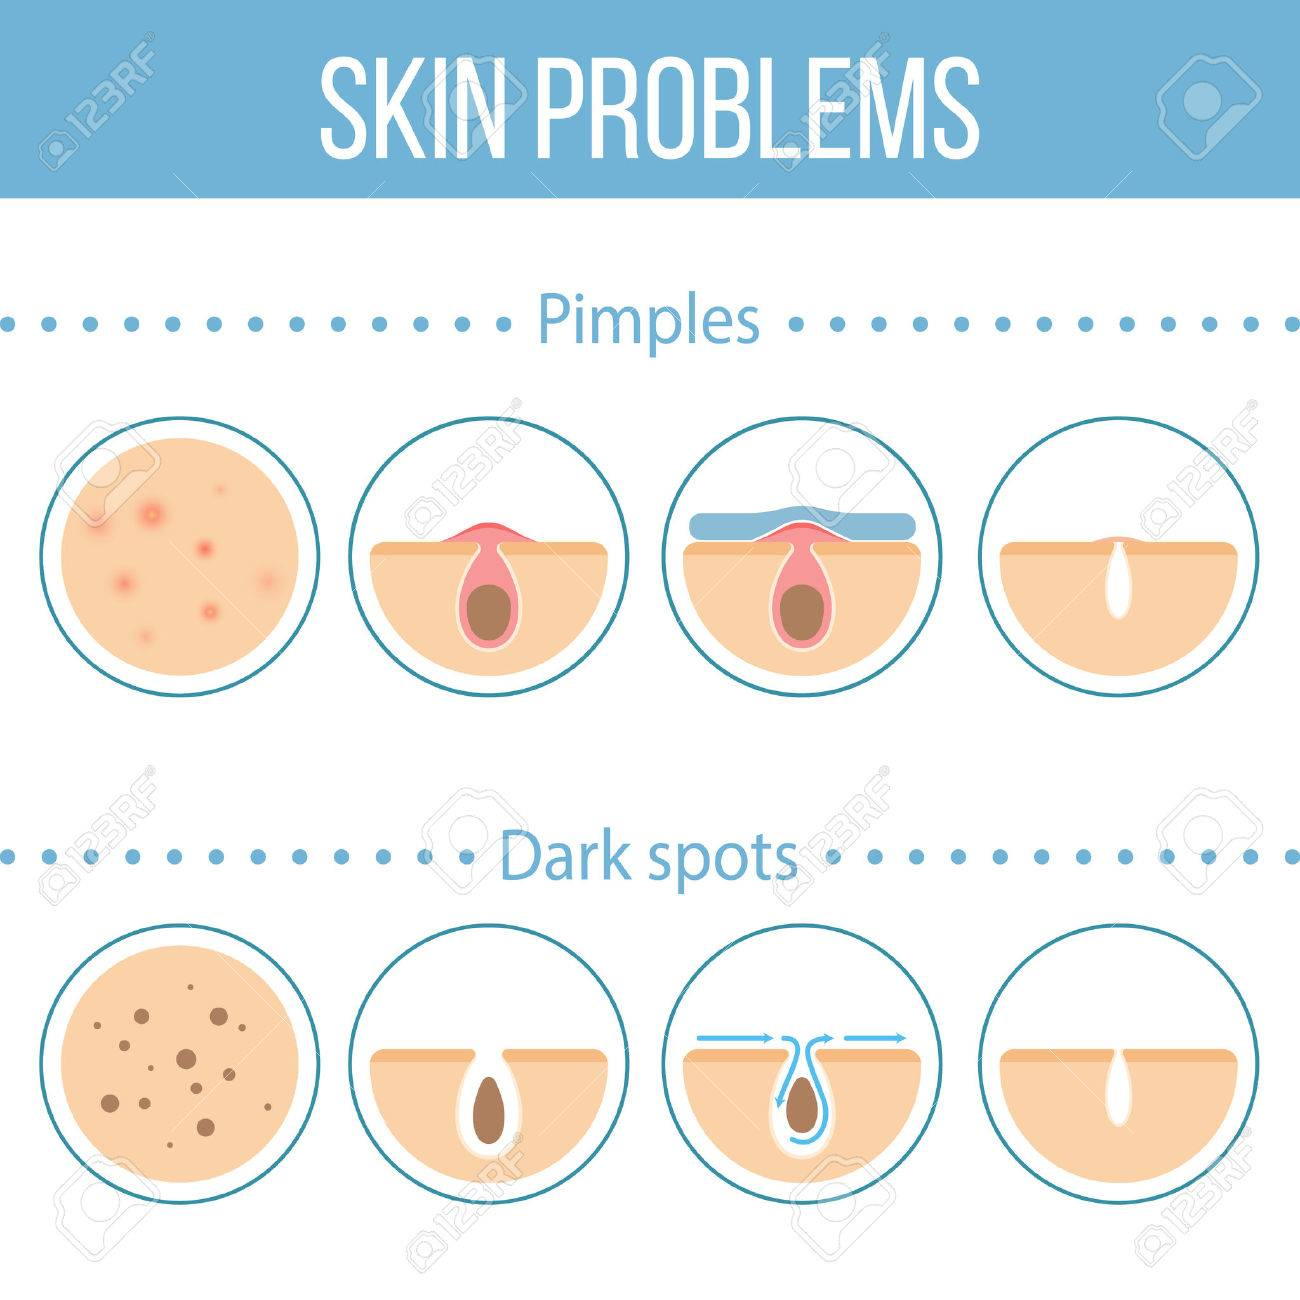 Skin problems icons set. - 60173280